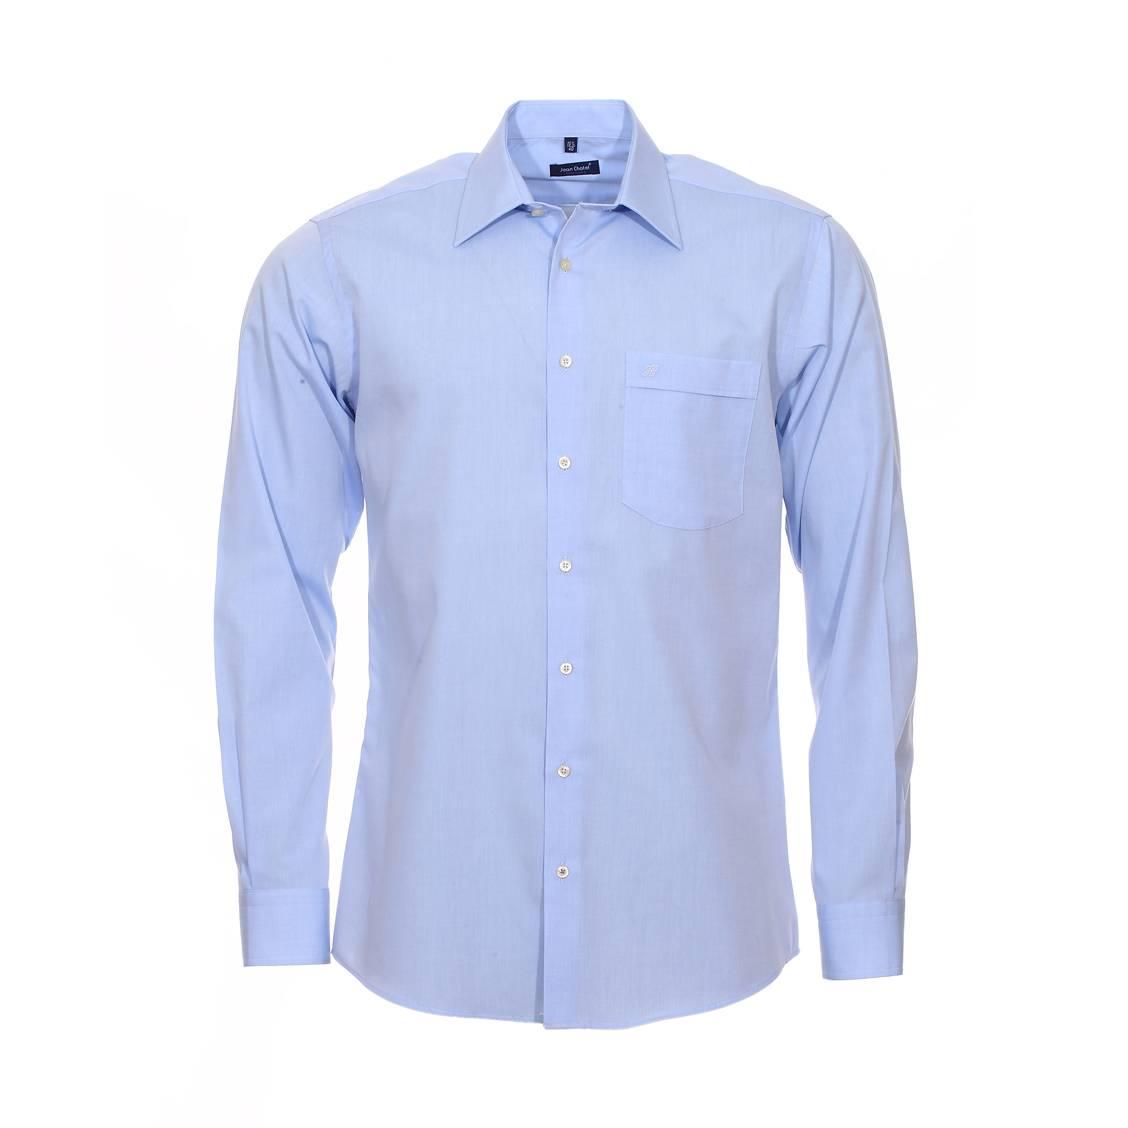 repasser pantalon costume great pantalon costume homme ajust super us bleu with repasser. Black Bedroom Furniture Sets. Home Design Ideas